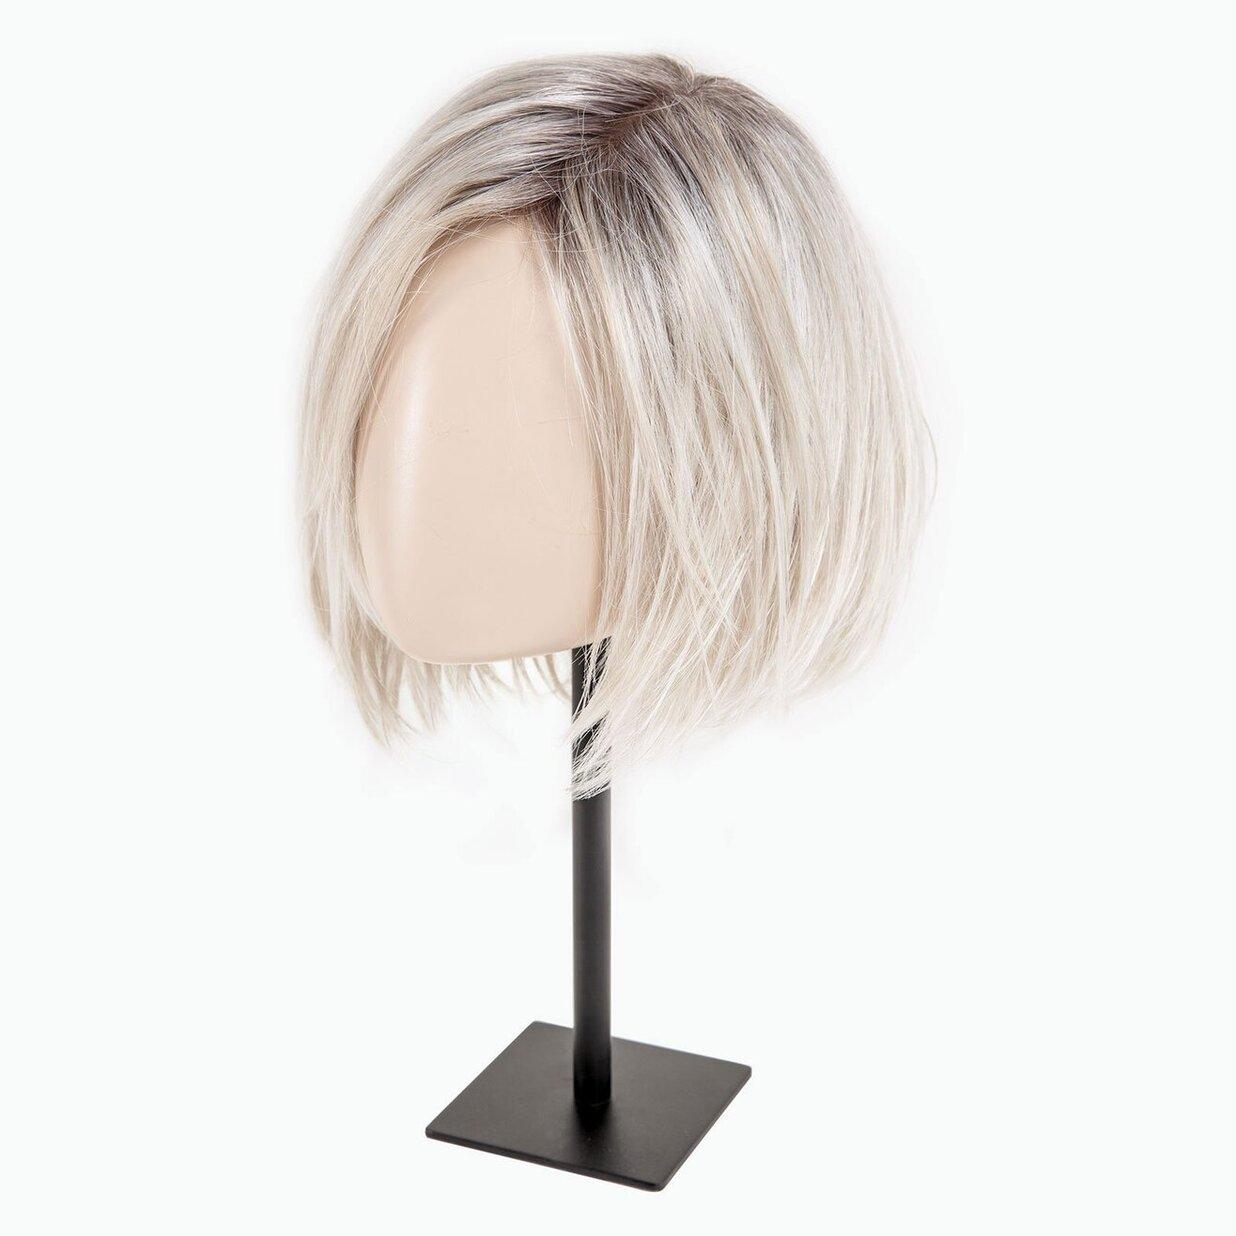 fizz hair topper hair pieces ellen wille mannequin